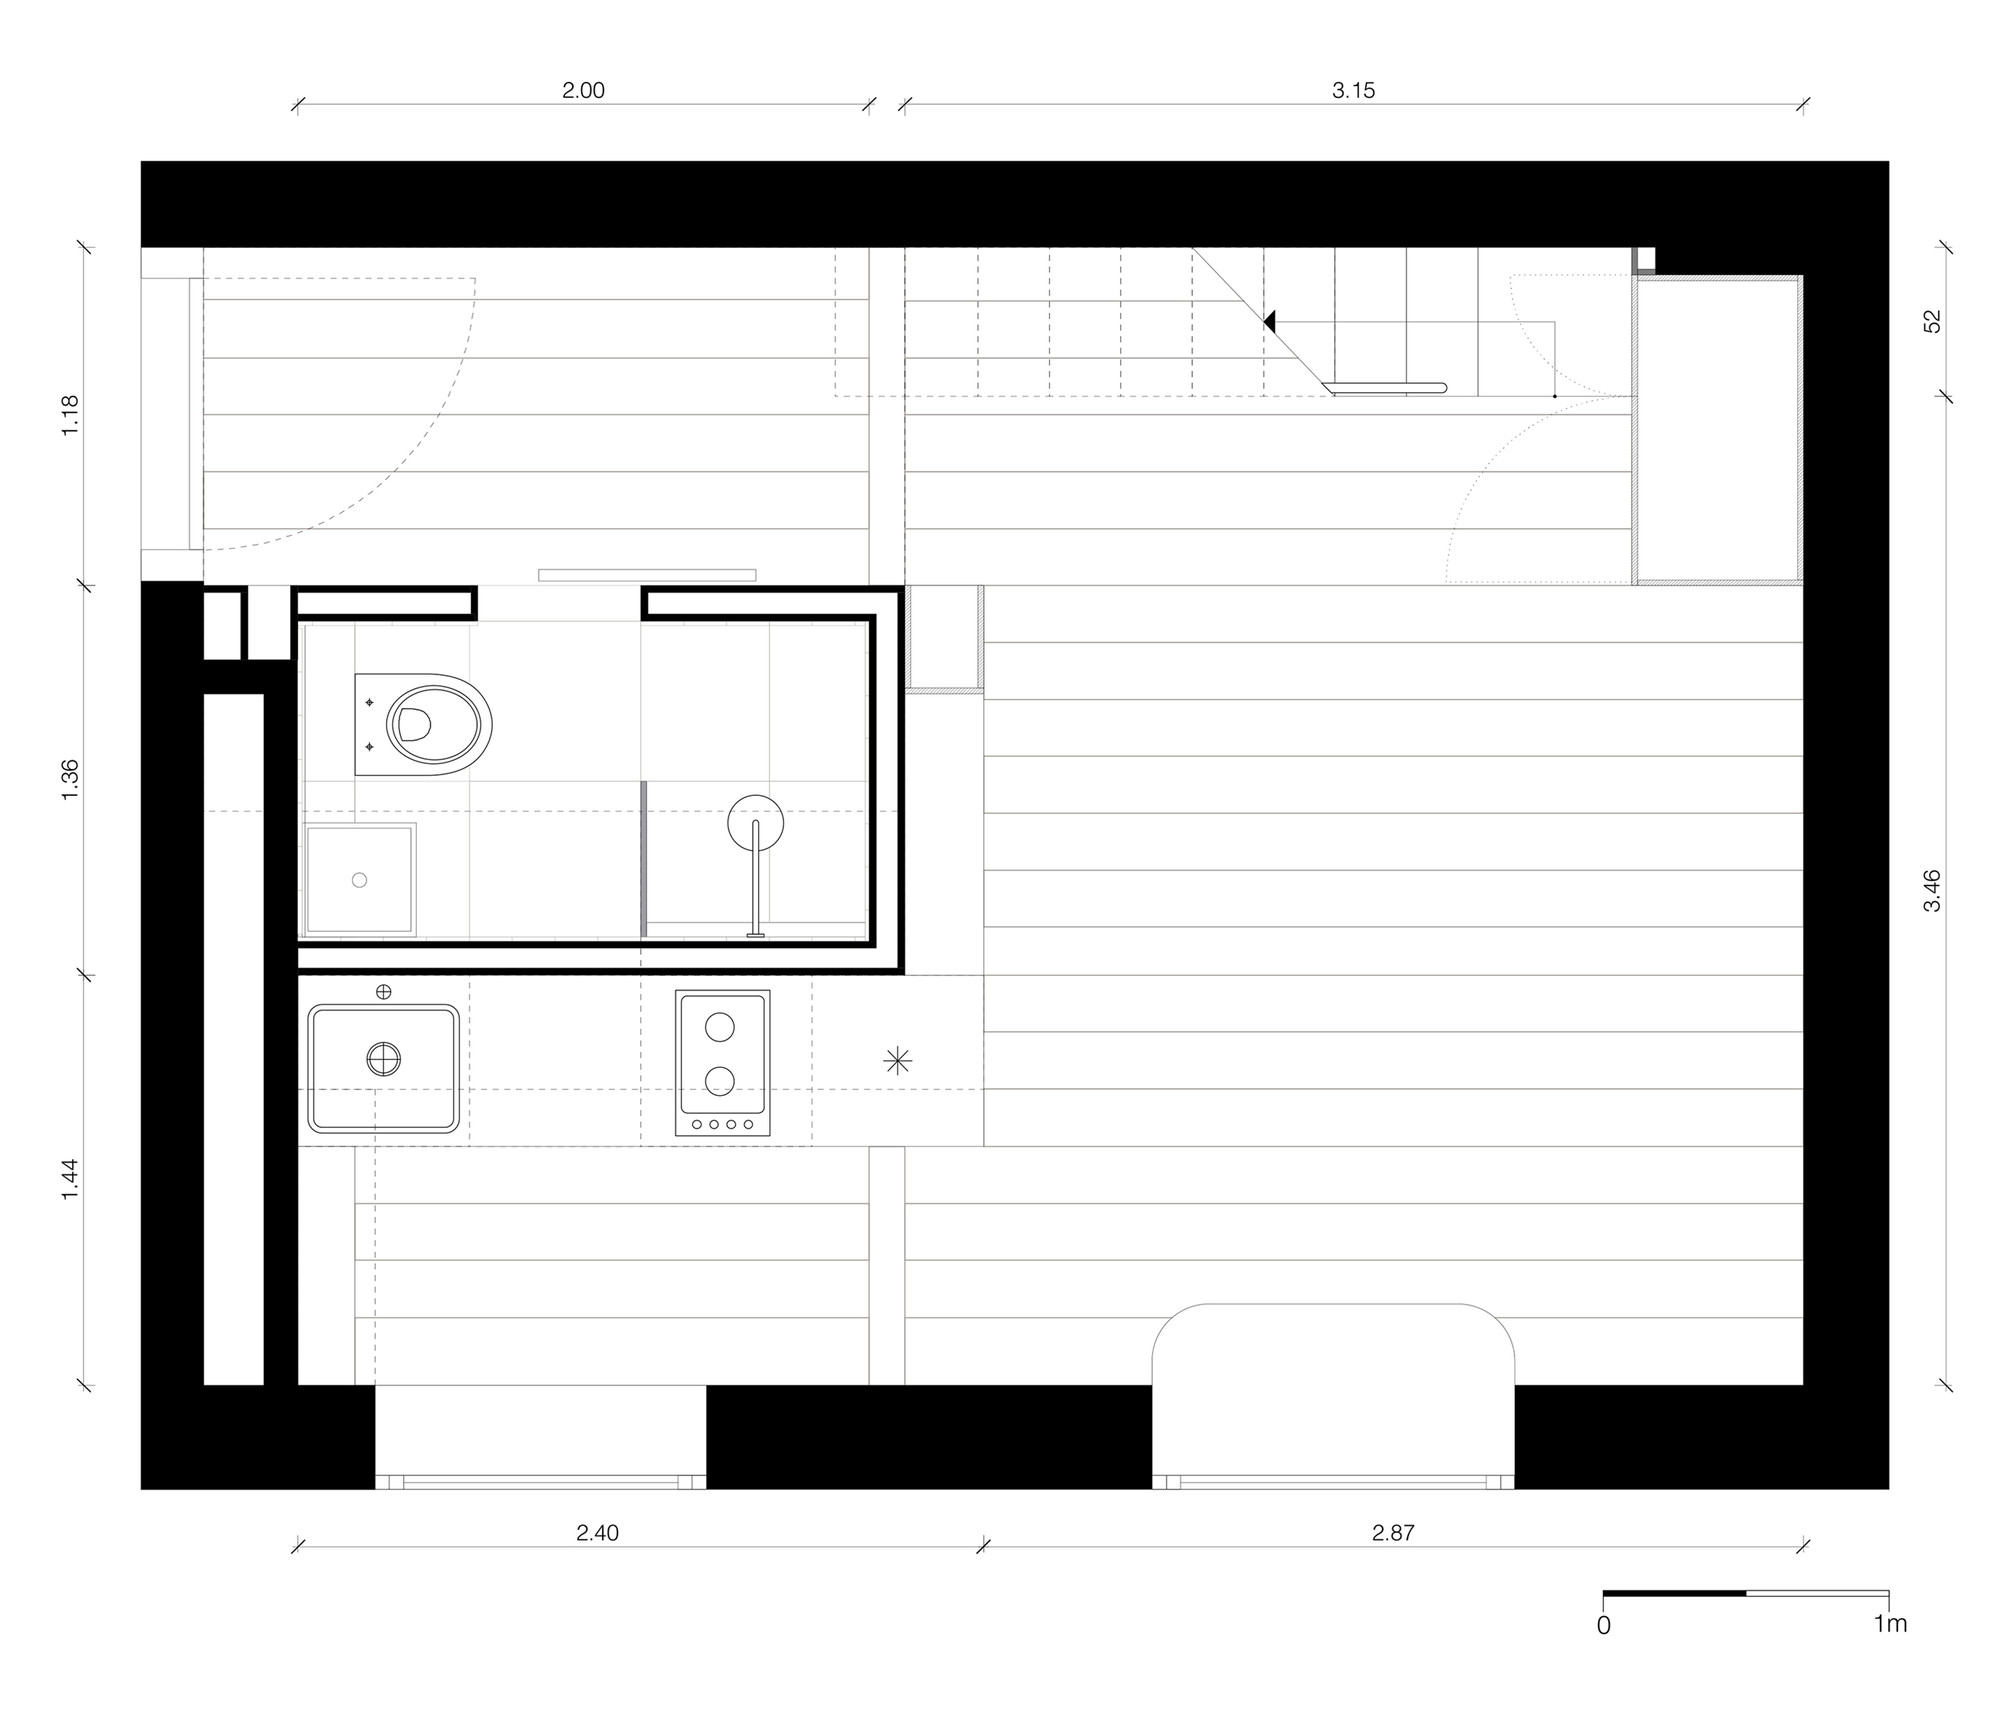 Micro Apartment In Berlin,Ground Floor Plan